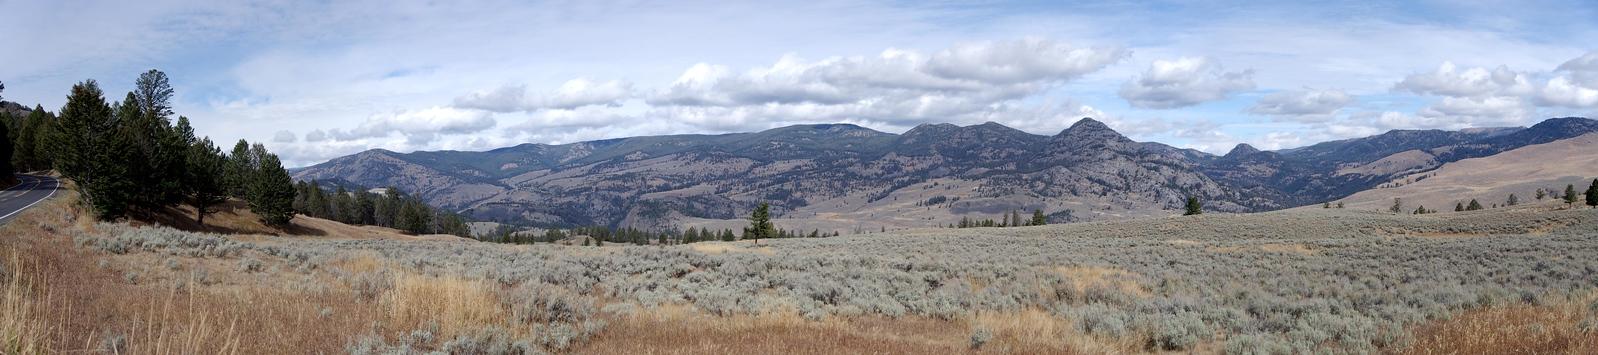 North Yellowstone NP